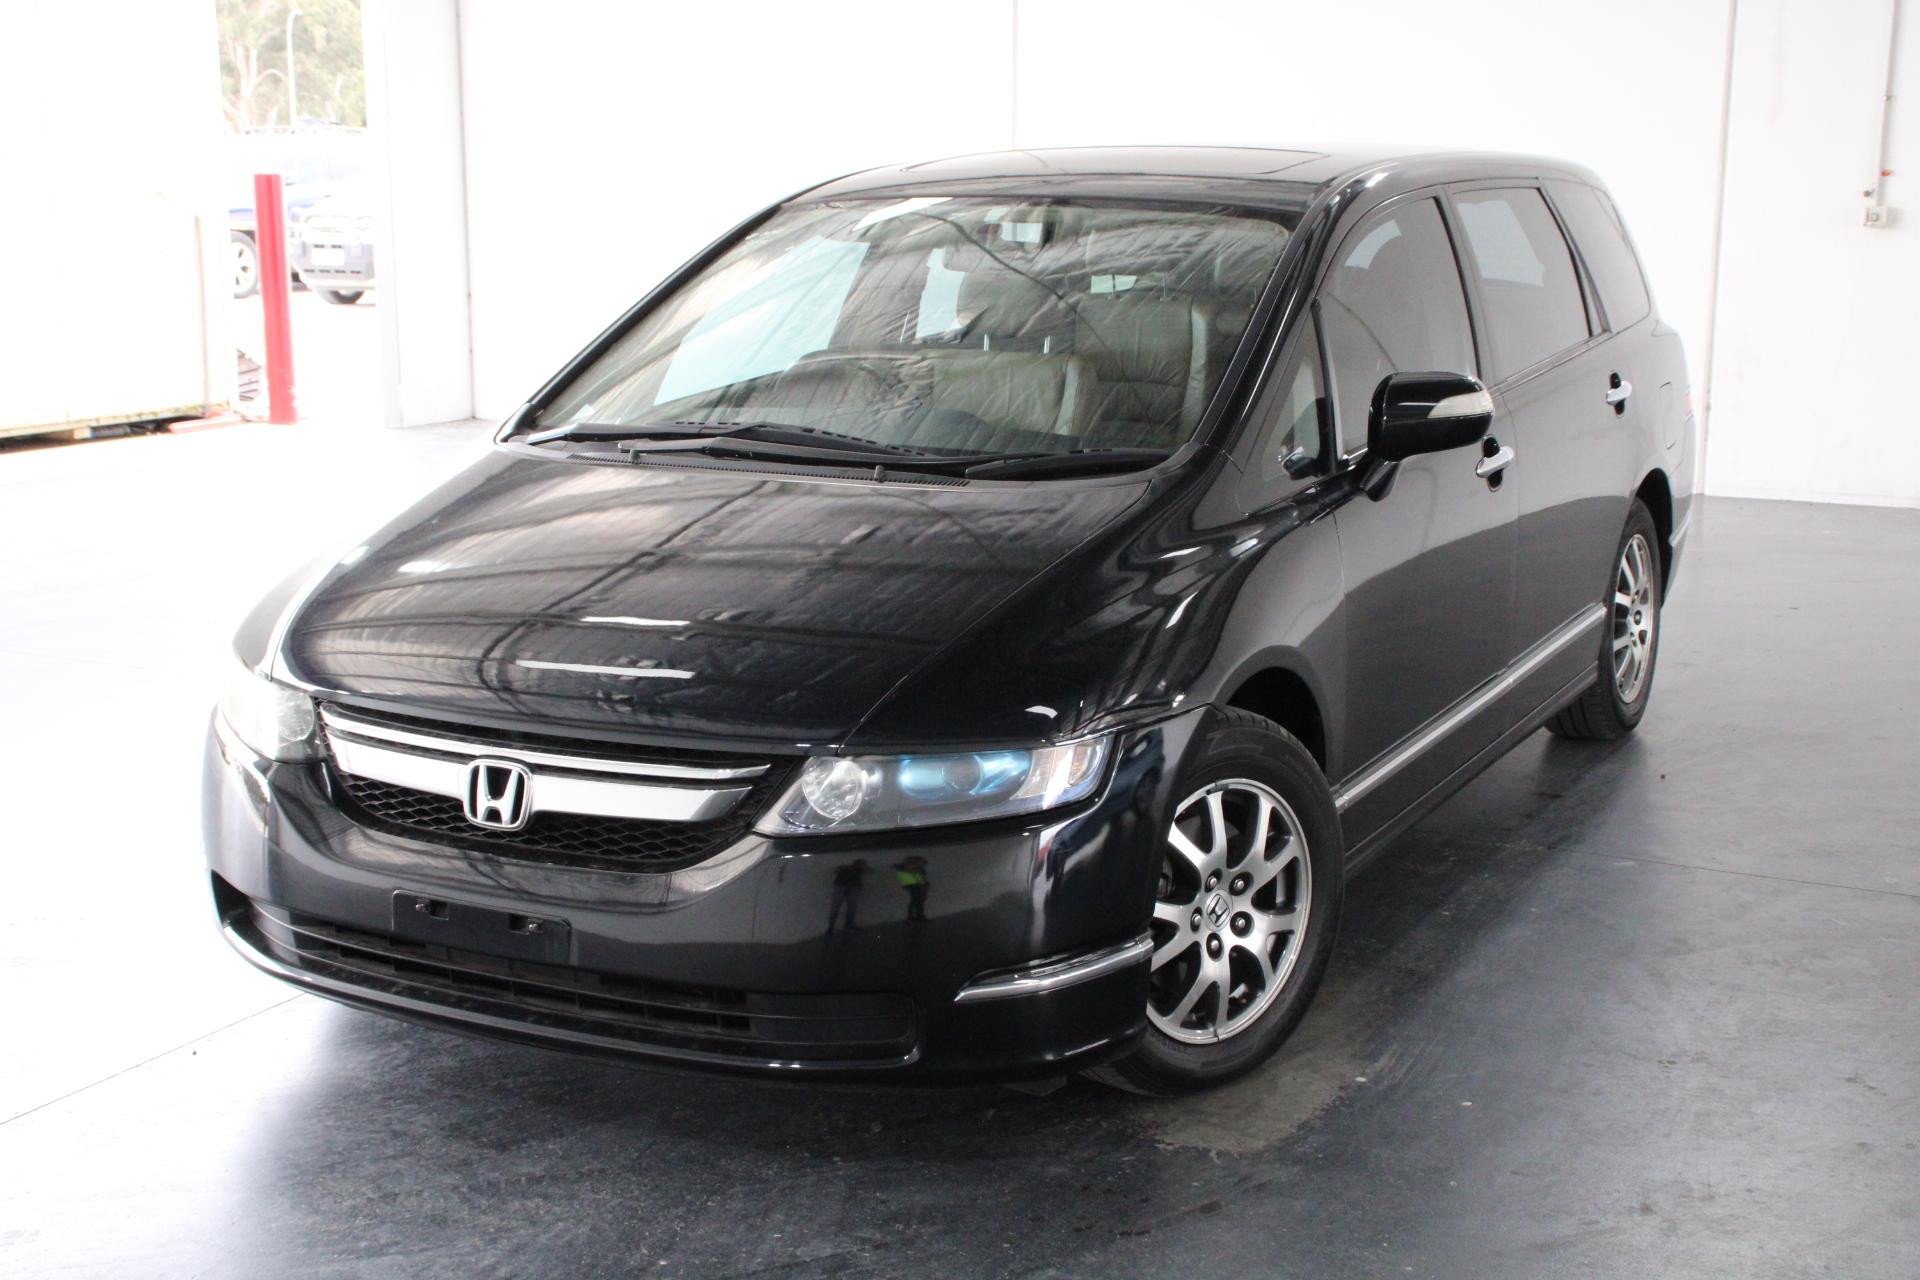 2008 Honda Odyssey Luxury Automatic 7 Seats People Mover